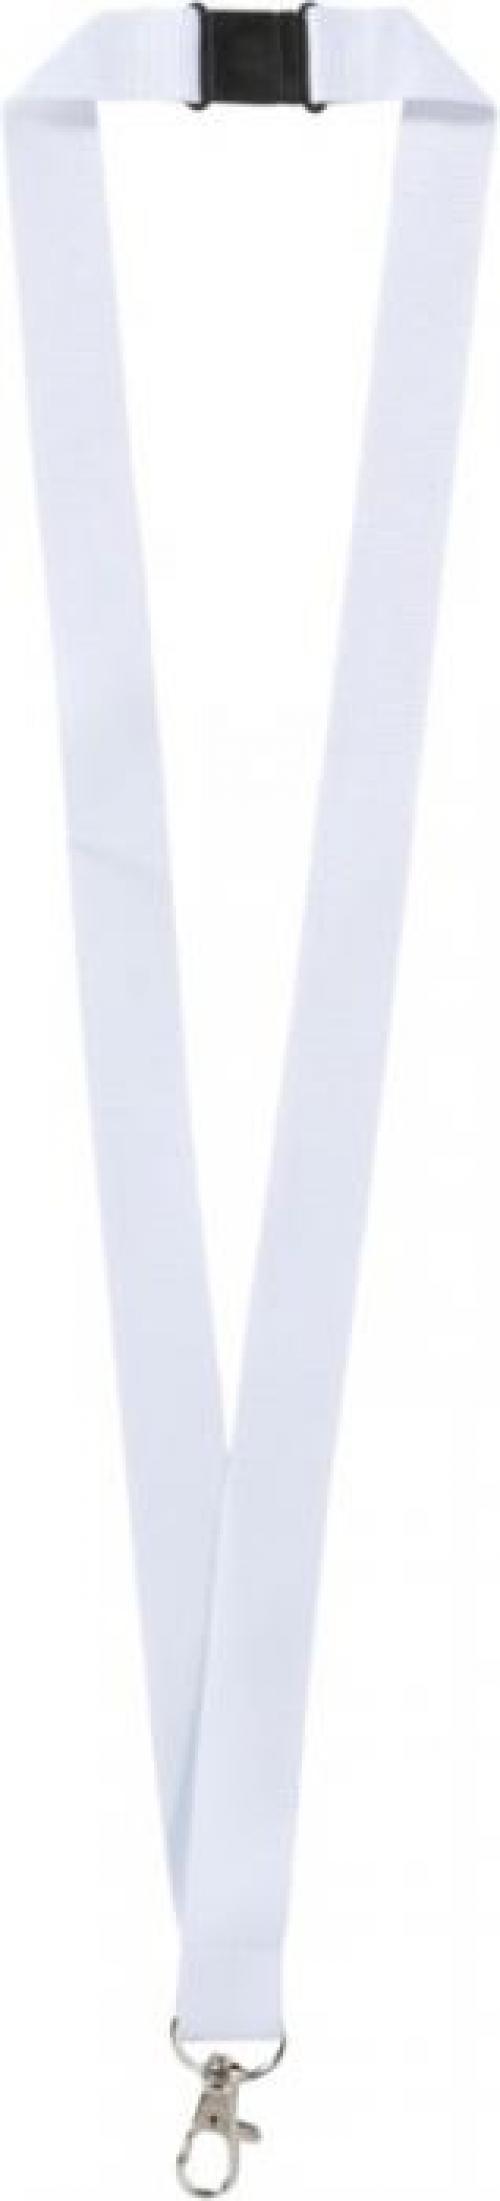 Cordón identificativo Iago